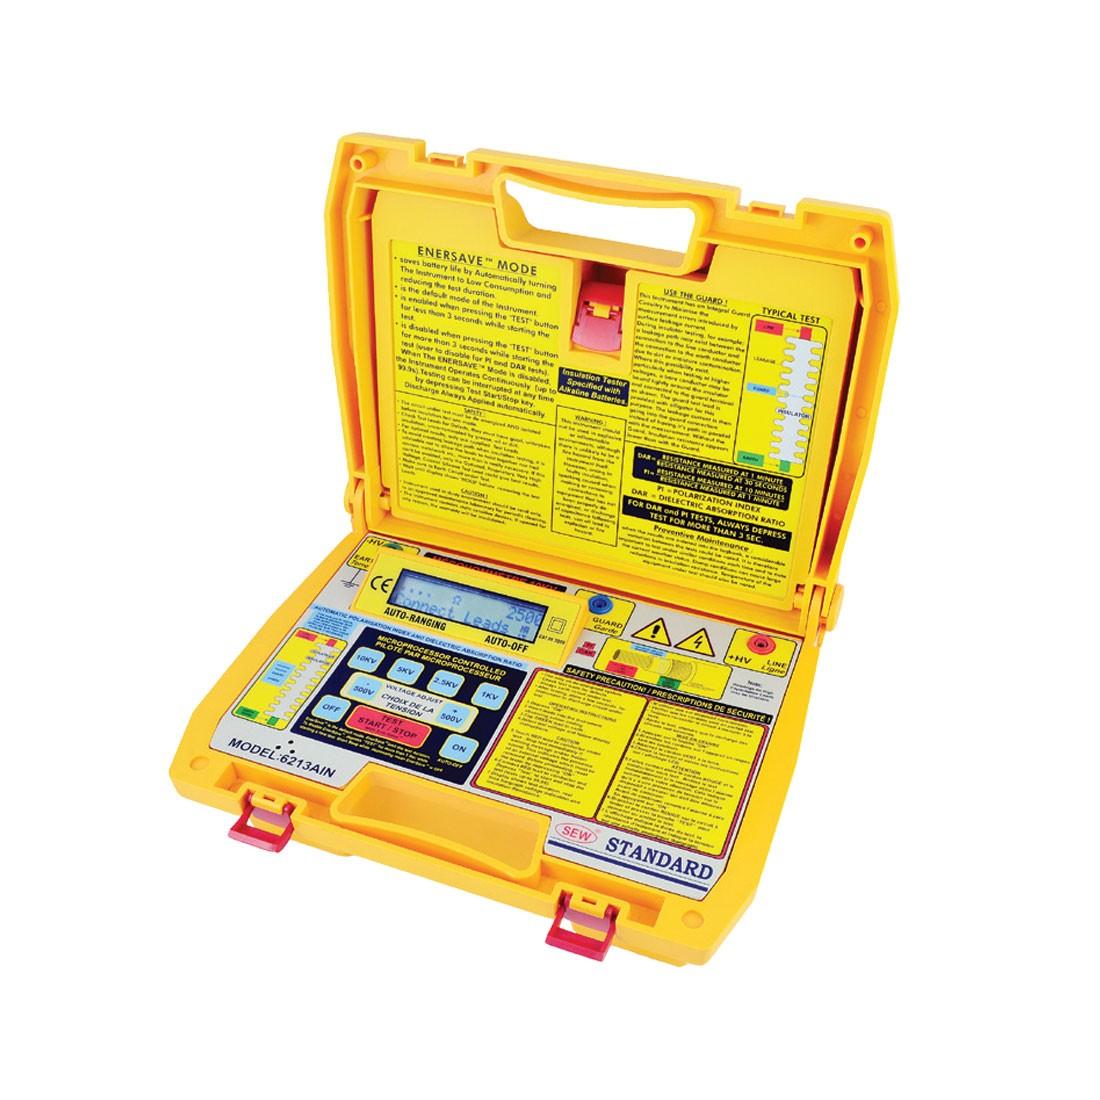 6213AIN Digital (Up to 10kV) Insulation Tester